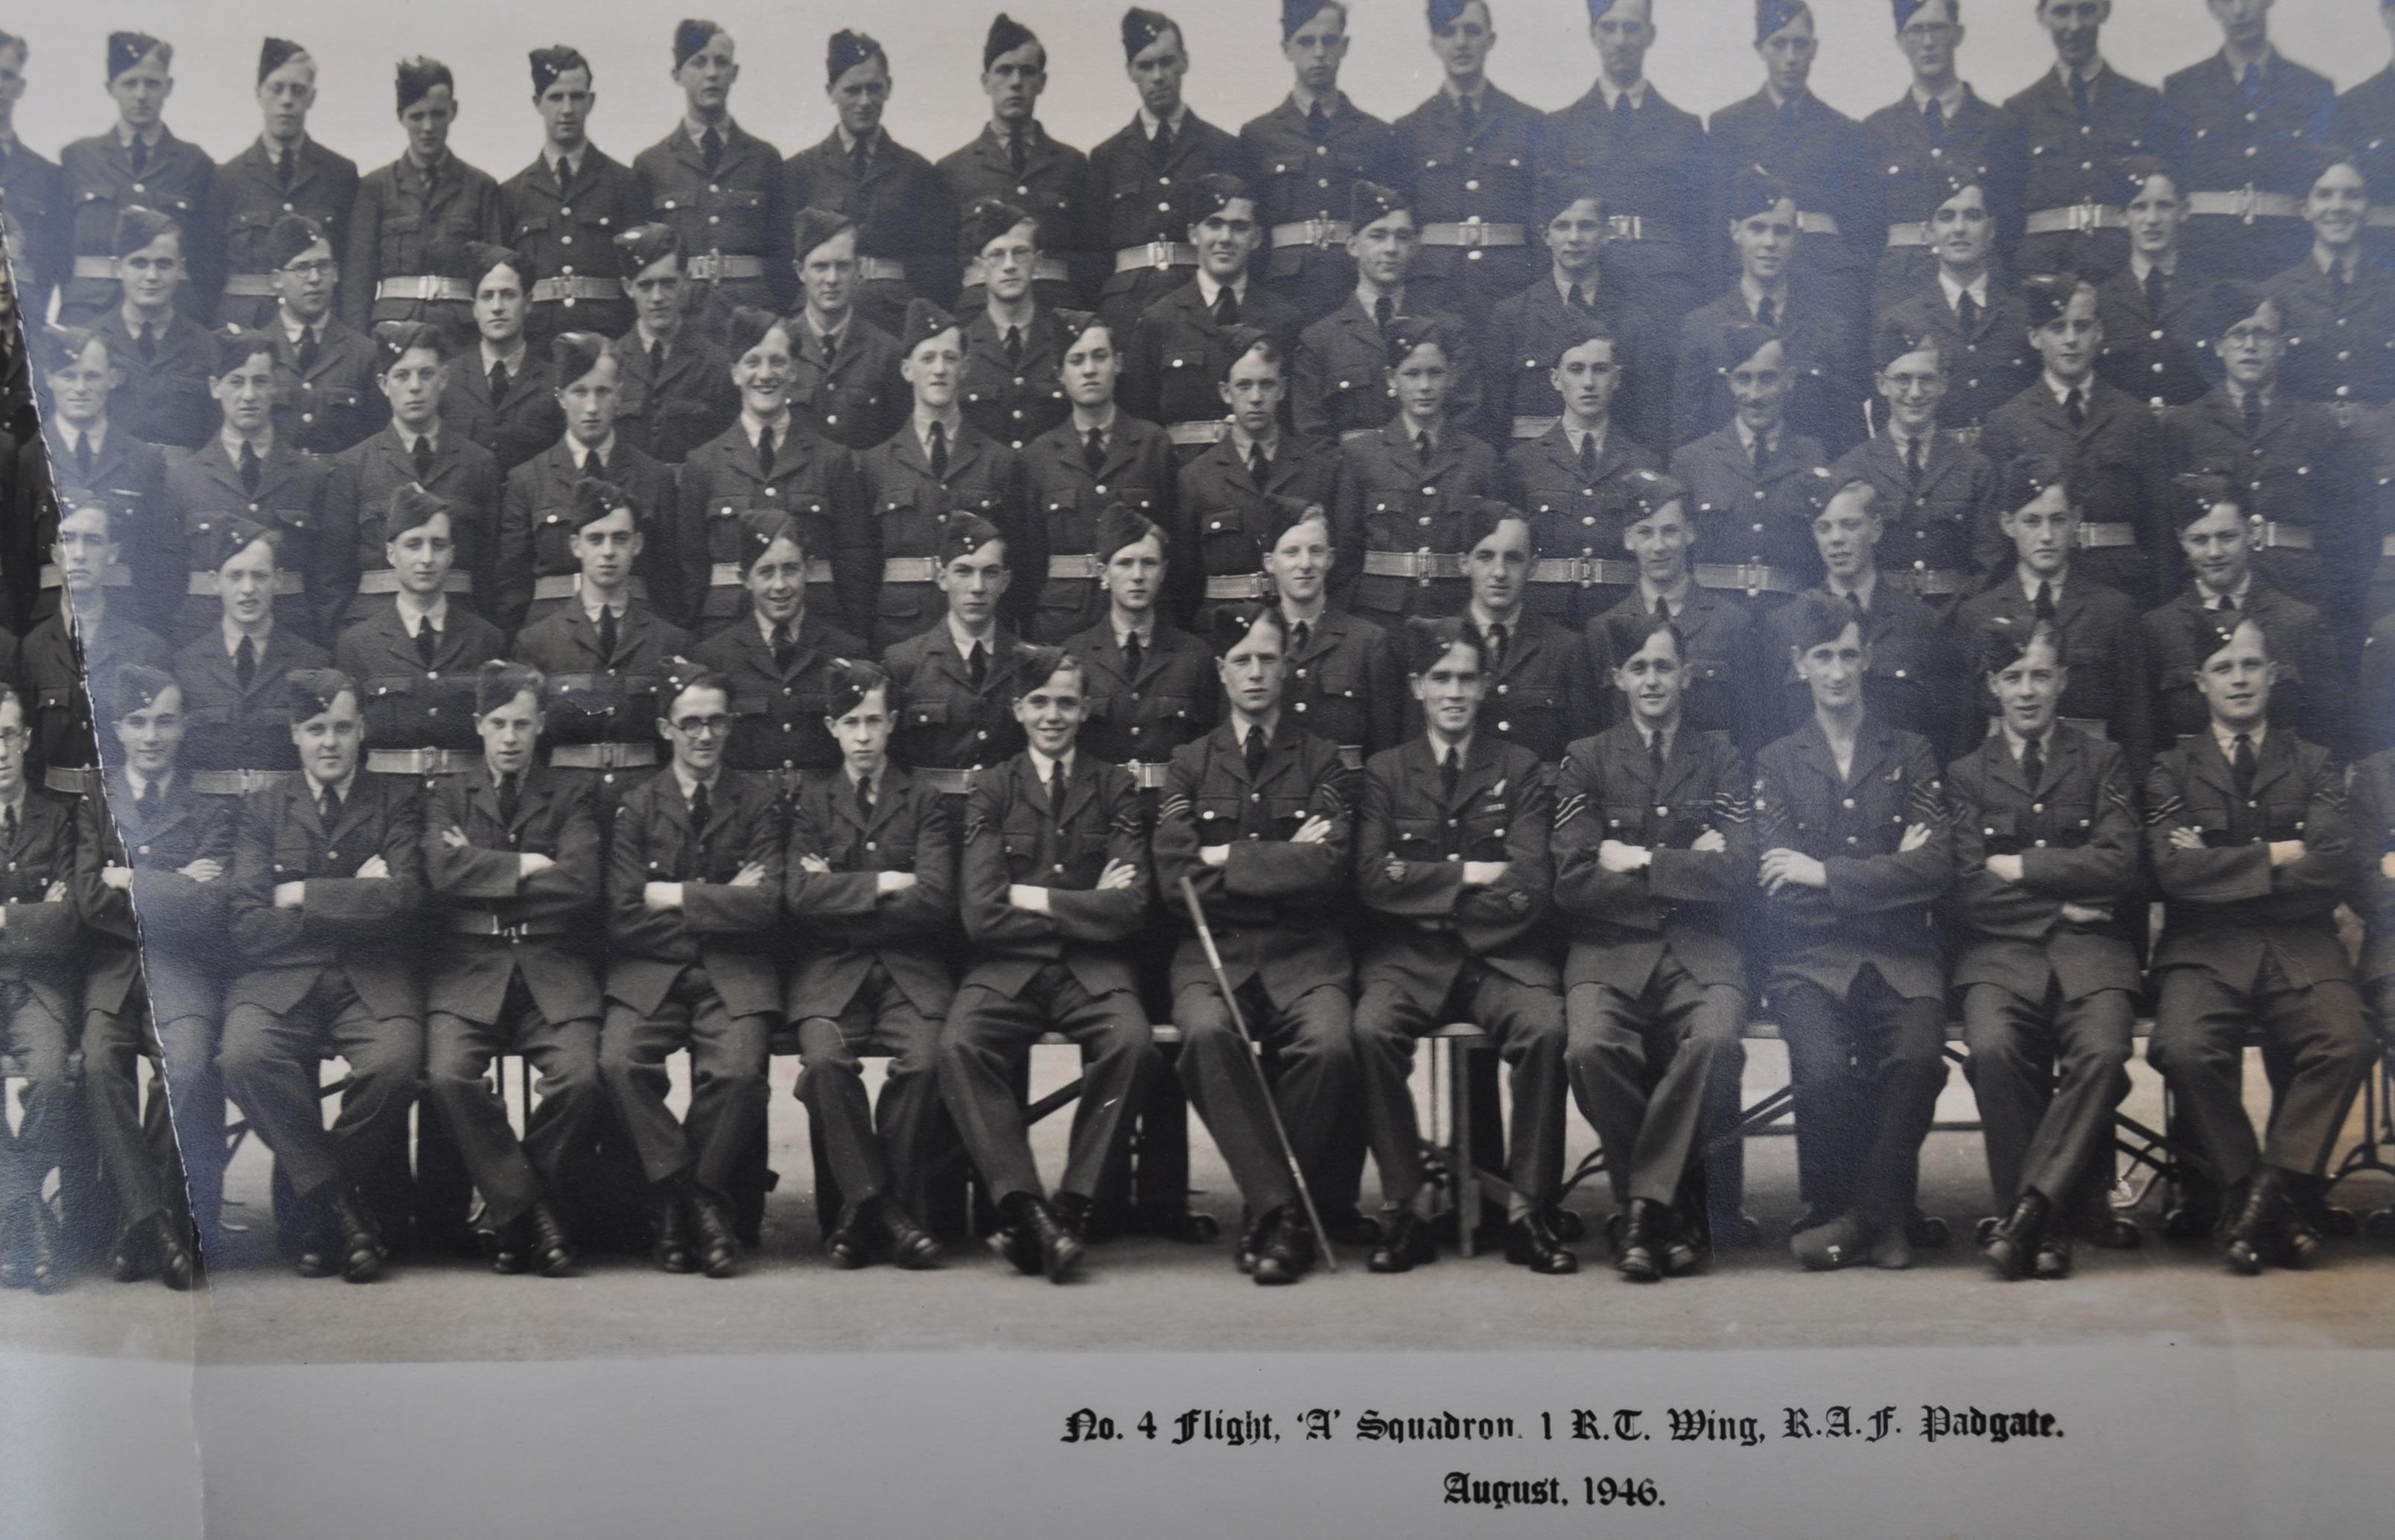 POST-WWII RAF PADGATE - BOB MONKHOUSE - AUTOGRAPHED REGIMENTAL PHOTOGRAPH - Image 4 of 8